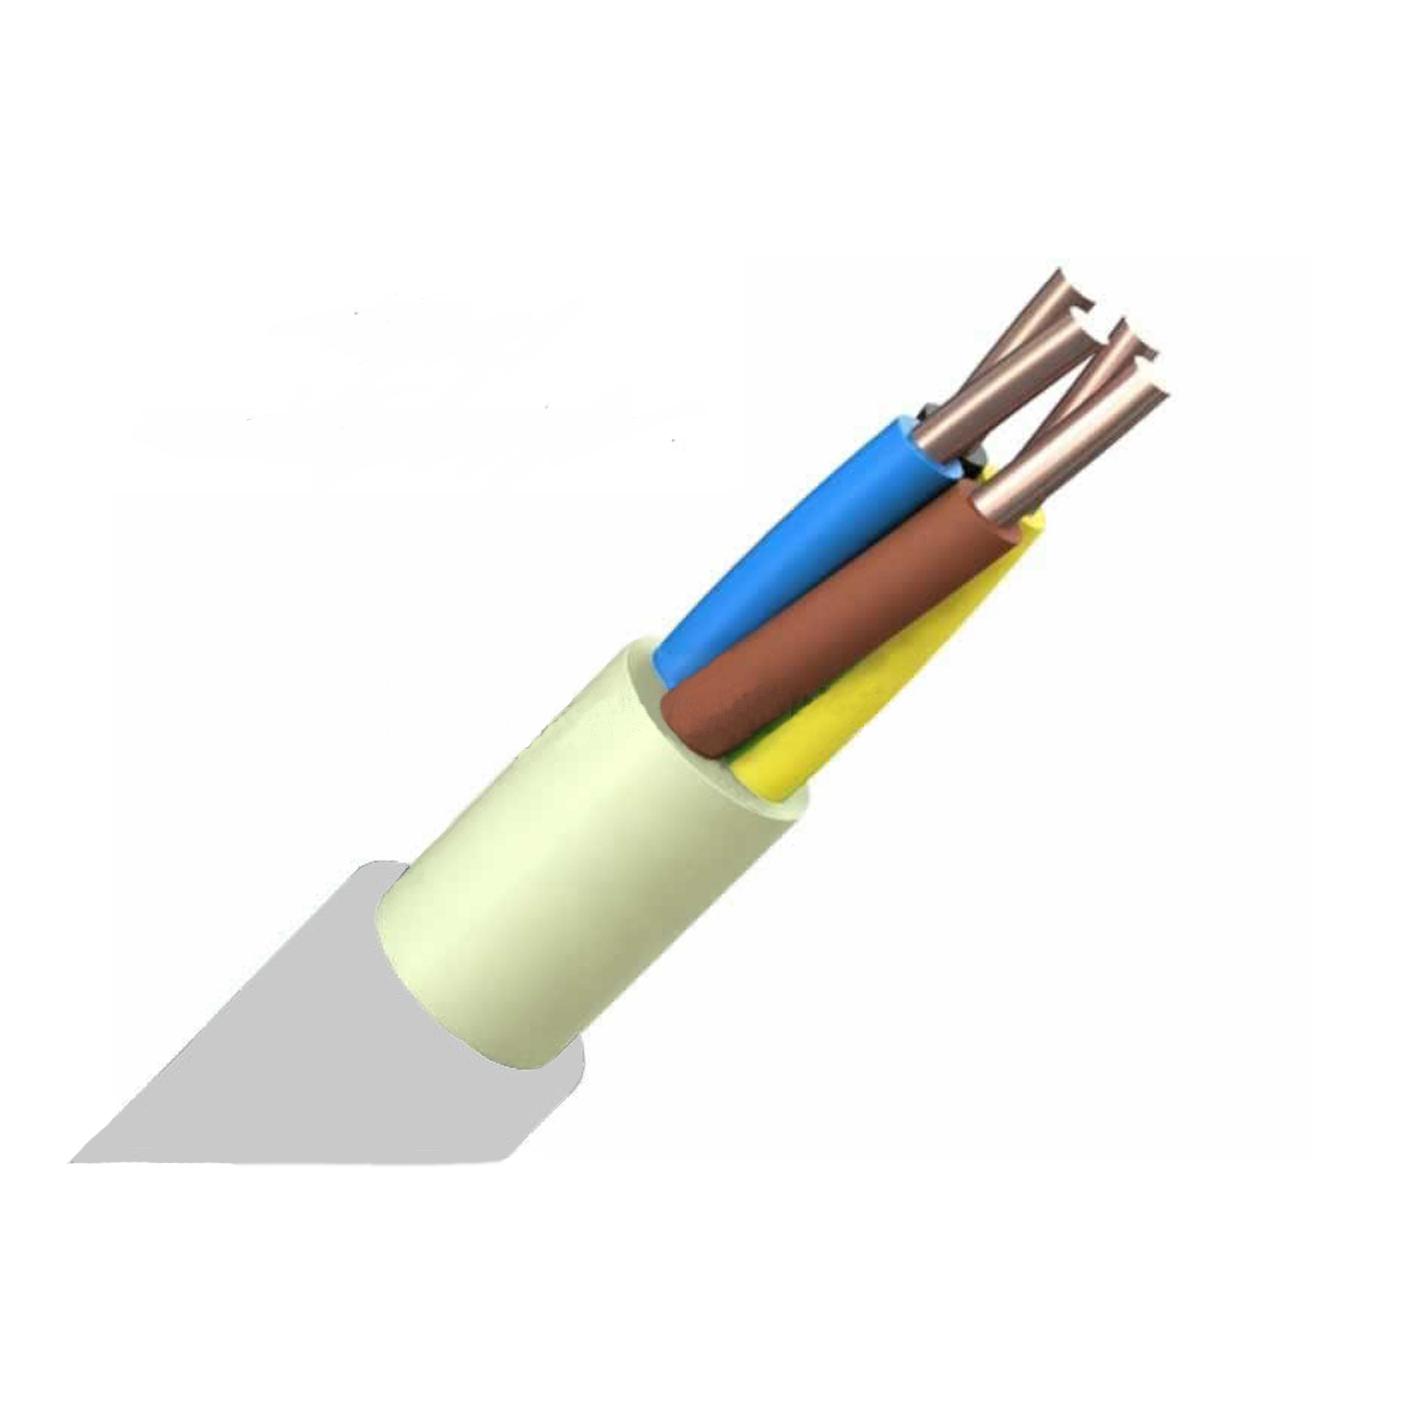 Öznur 5x4 NYM (NVV) Kablo